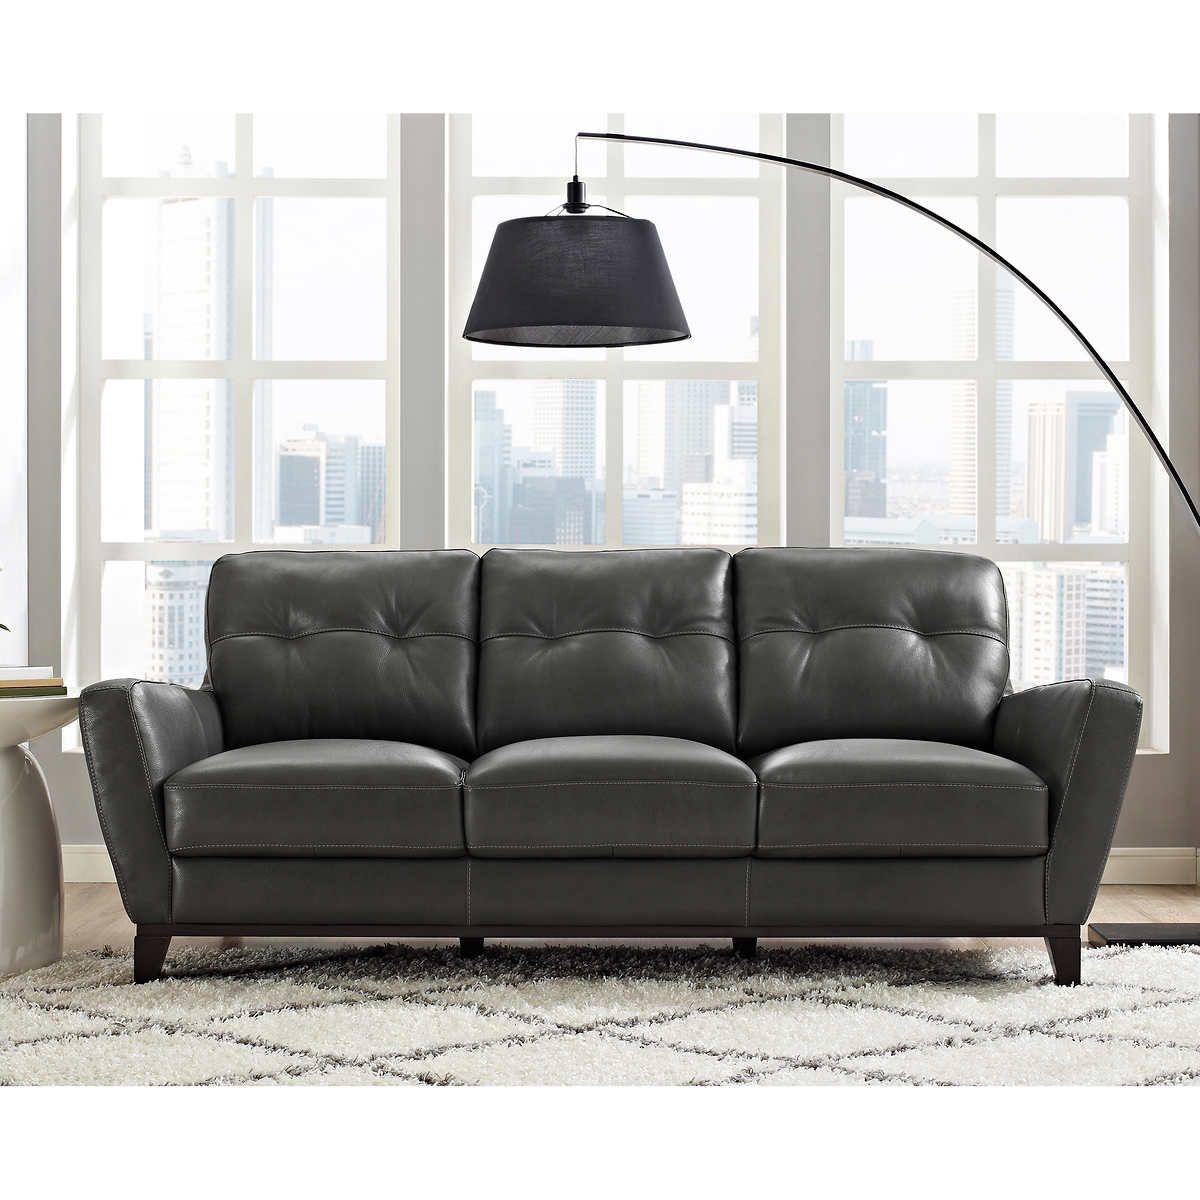 Natuzzi Group Mills Leather Sofa Leather Sofa Top Grain Leather Sofa Best Leather Sofa